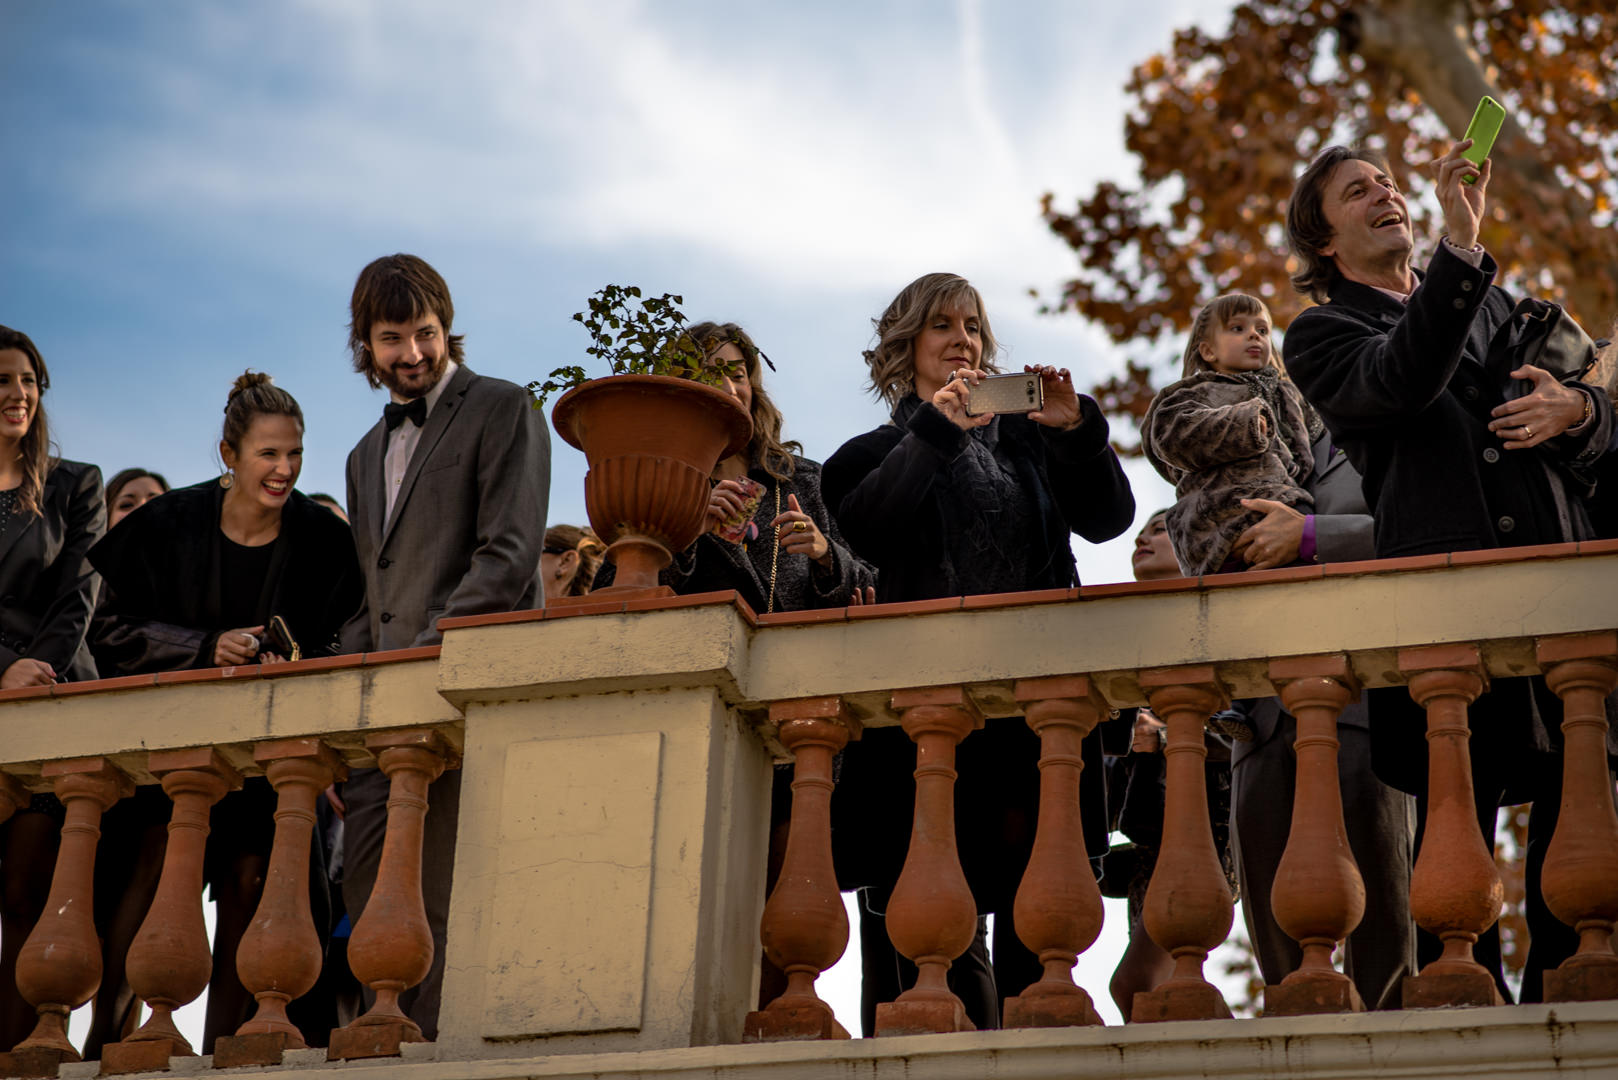 Same-sex-wedding-barcelona-boda- gay-samesex-engagement-Rafael-Torres-fotografo-bodas-sevilla-madrid-barcelona-wedding-photographer--9.jpg